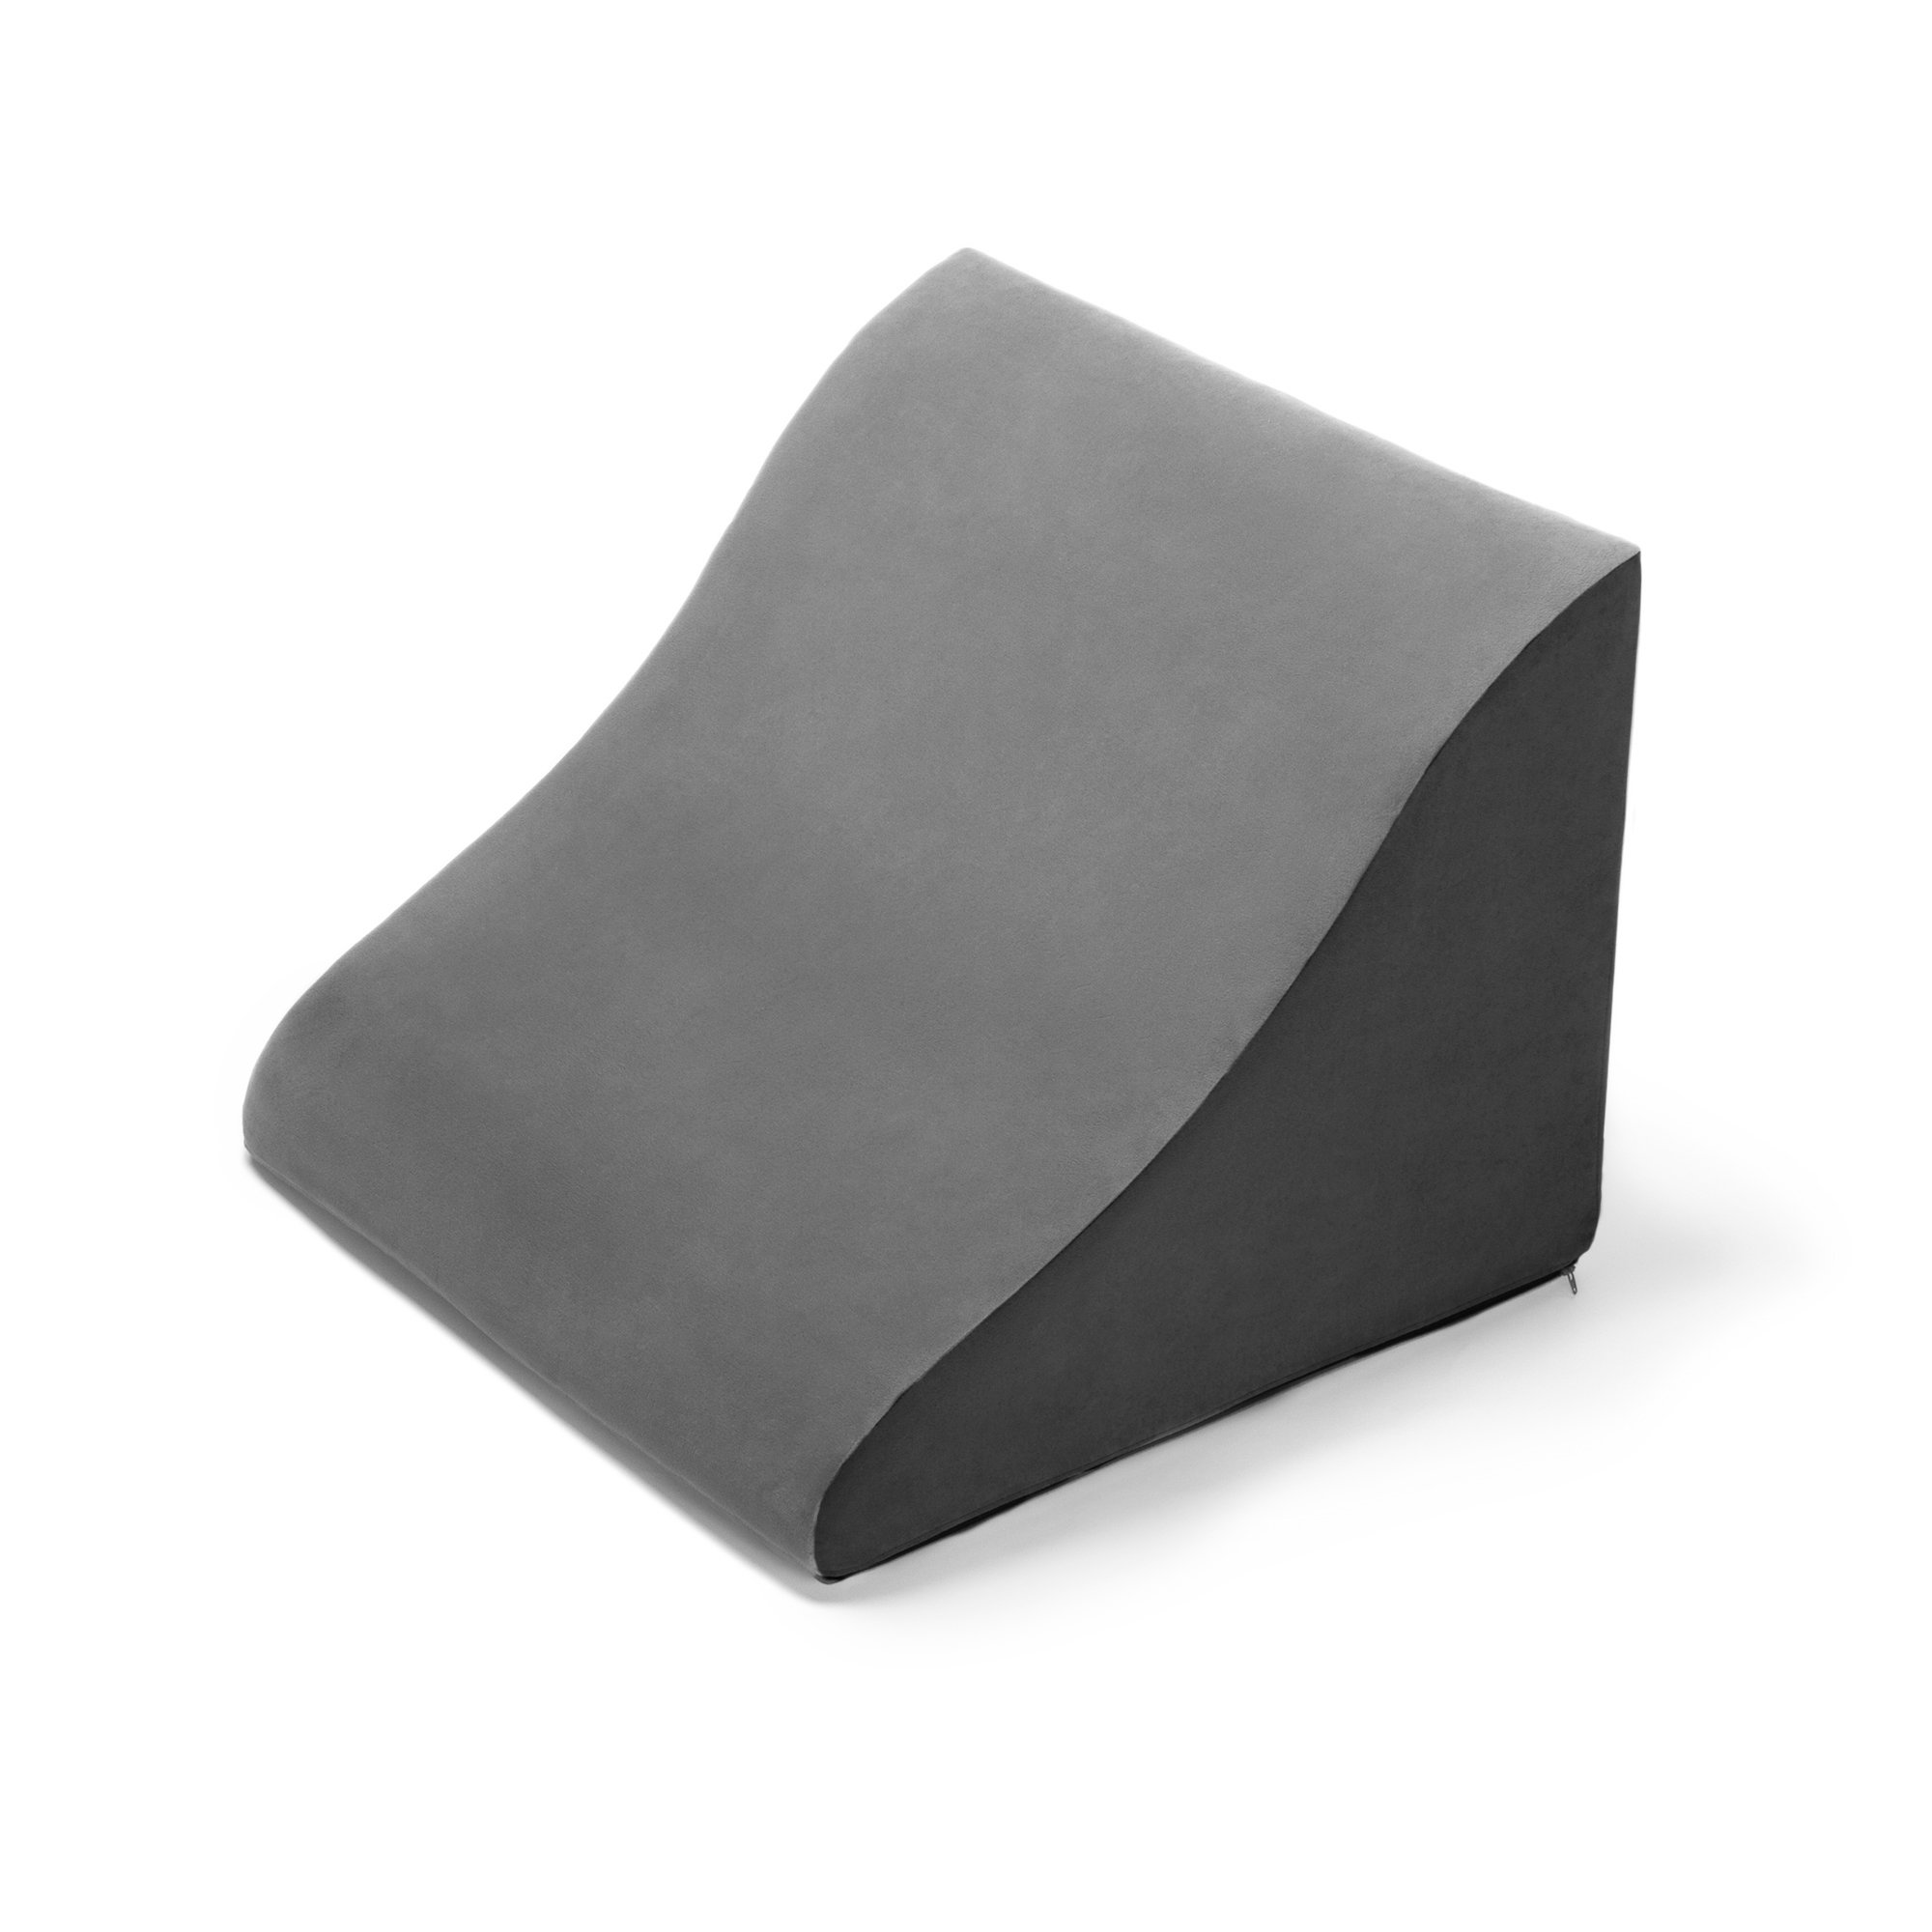 Avana Berkie Back Rest Memory Foam Back & Lumbar Pillow, Grey/Black